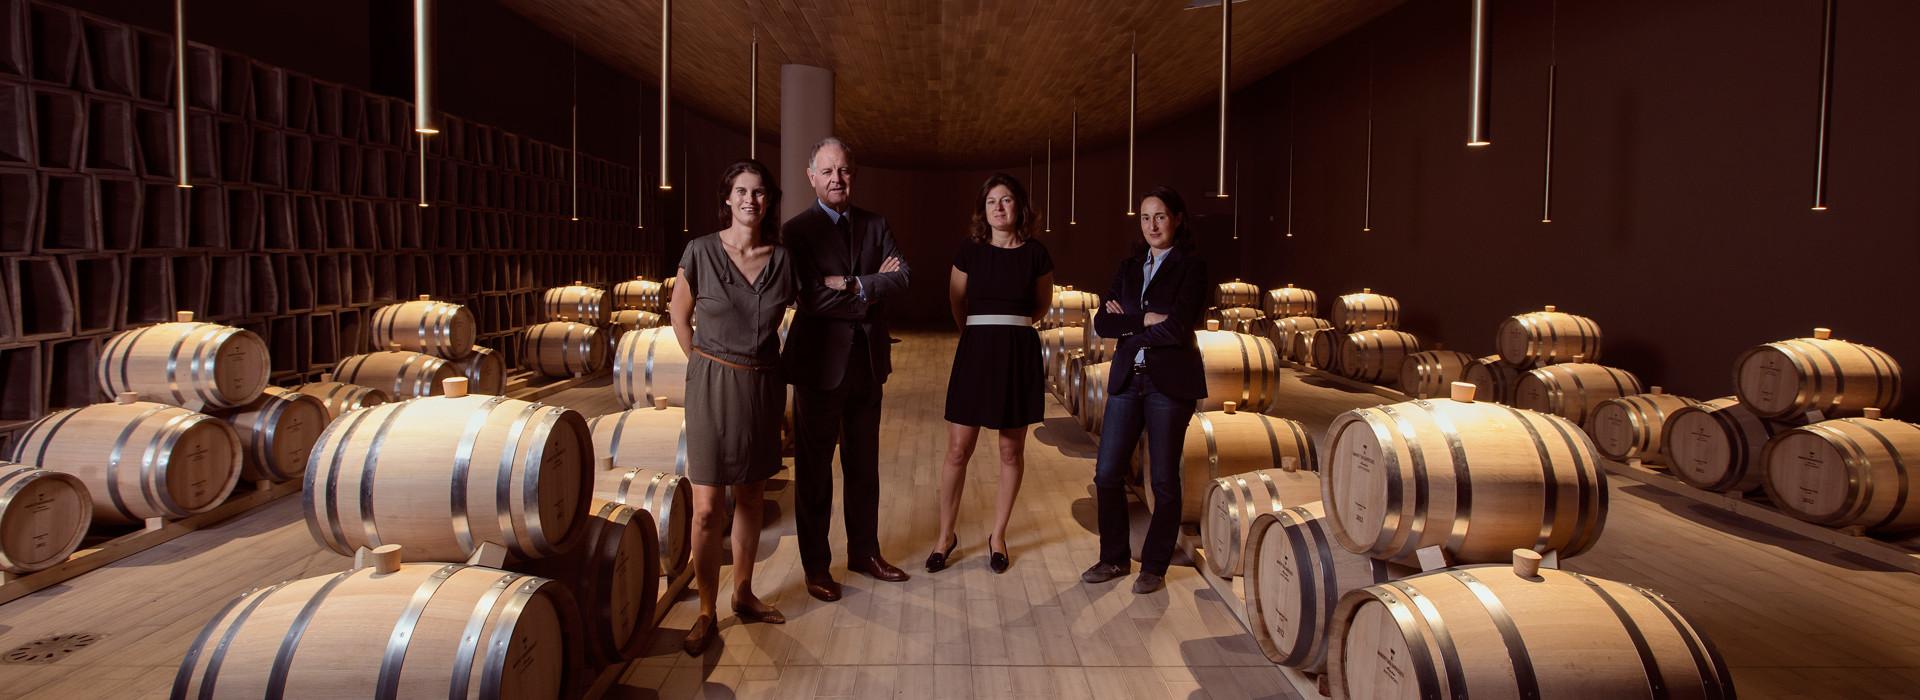 Antinori Family in wine cellar